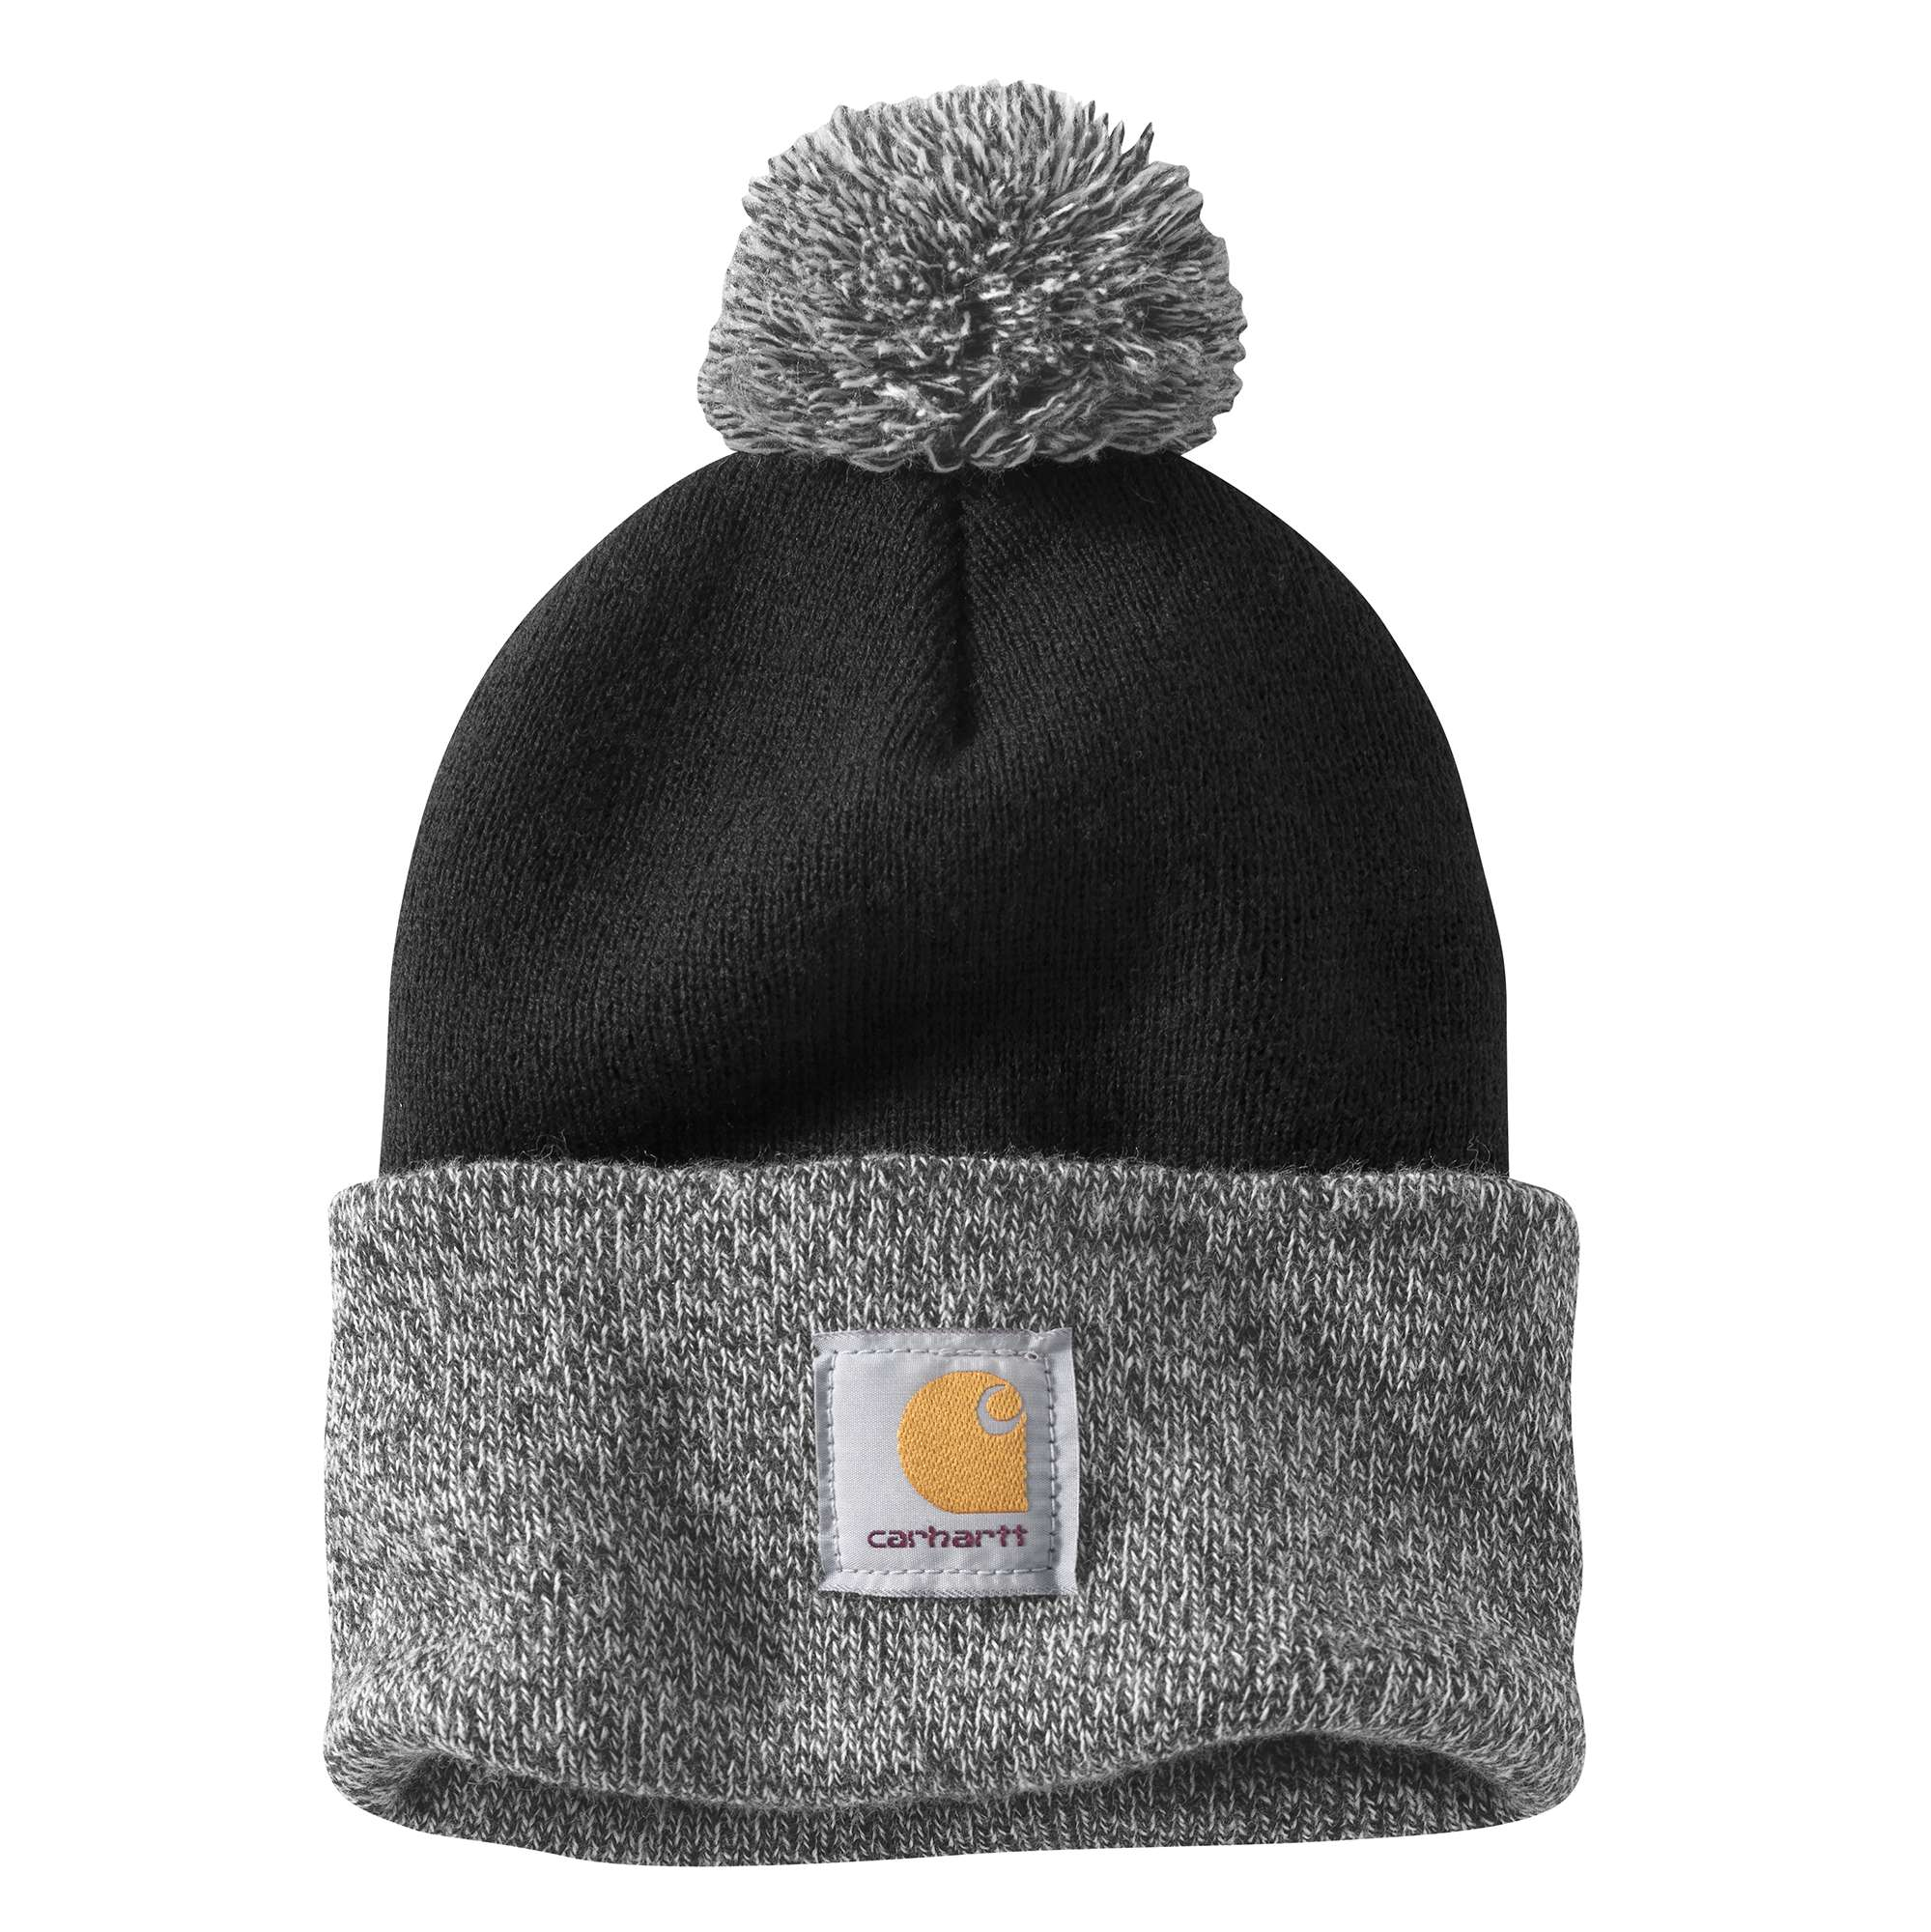 Carhartt Lookout Pom Pom Hat